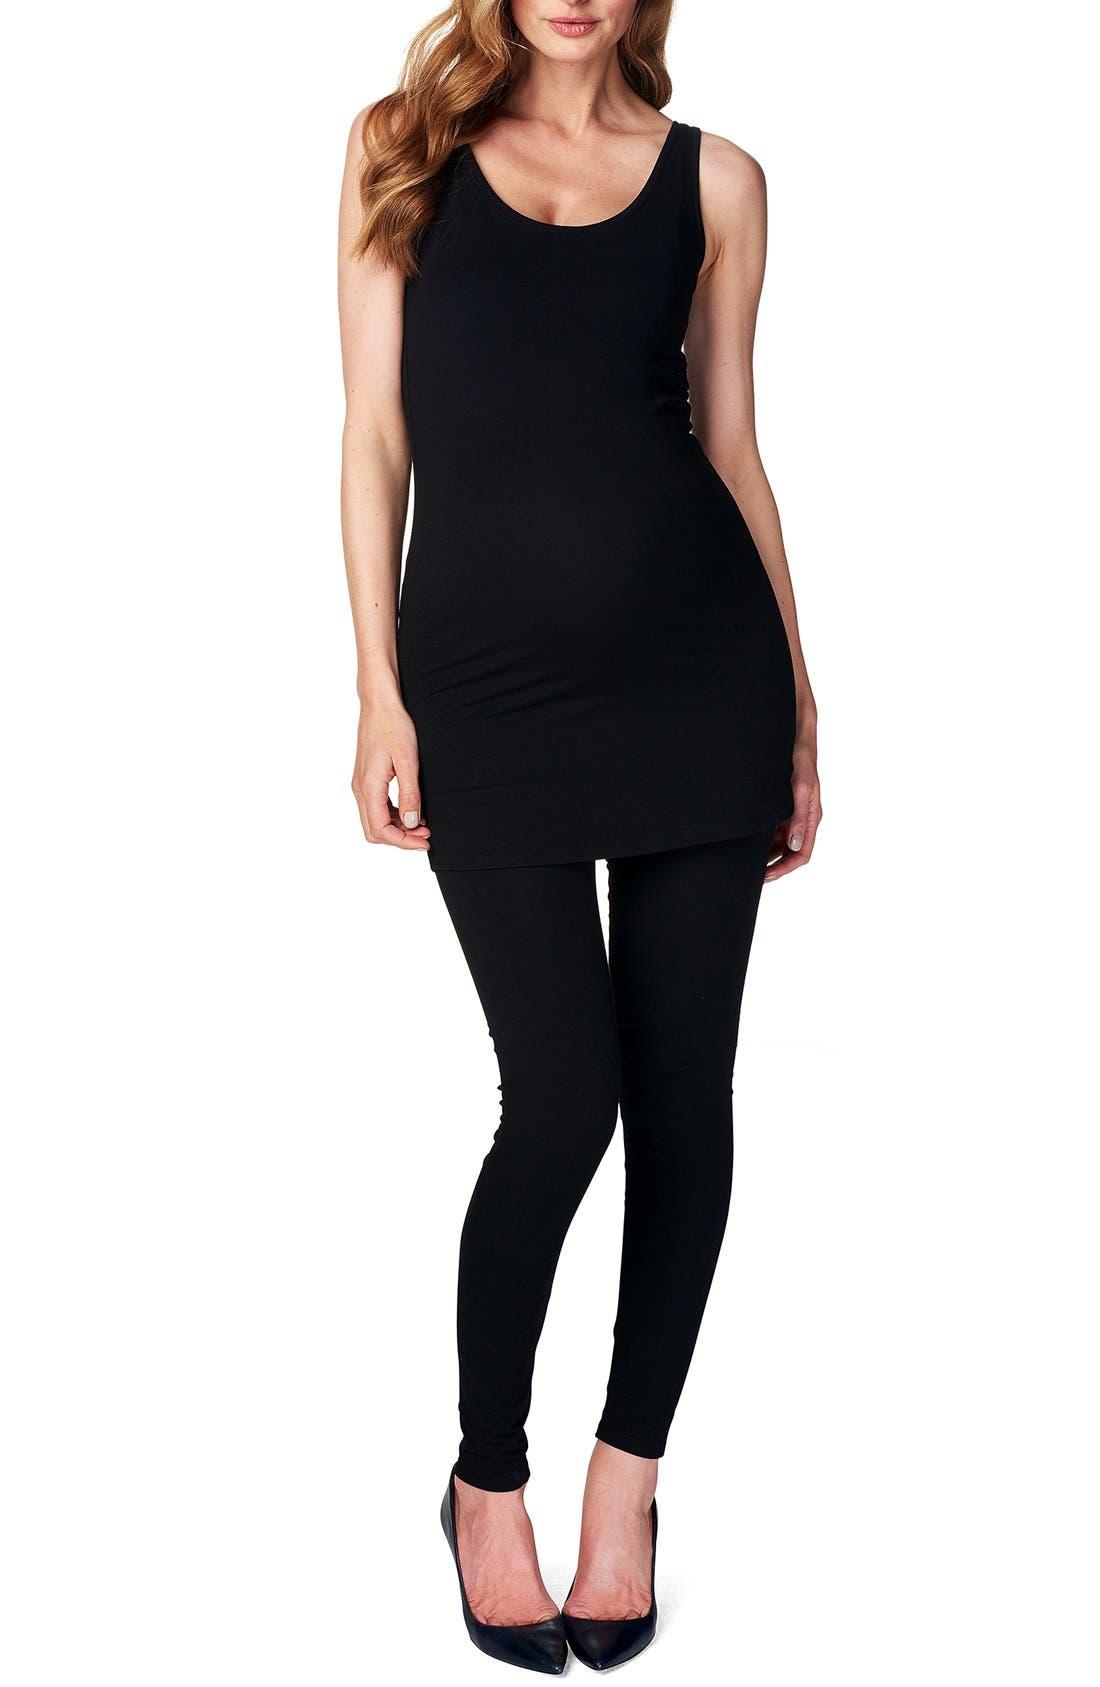 'Amsterdam' Scoop Neck Long Maternity Top,                         Main,                         color, BLACK